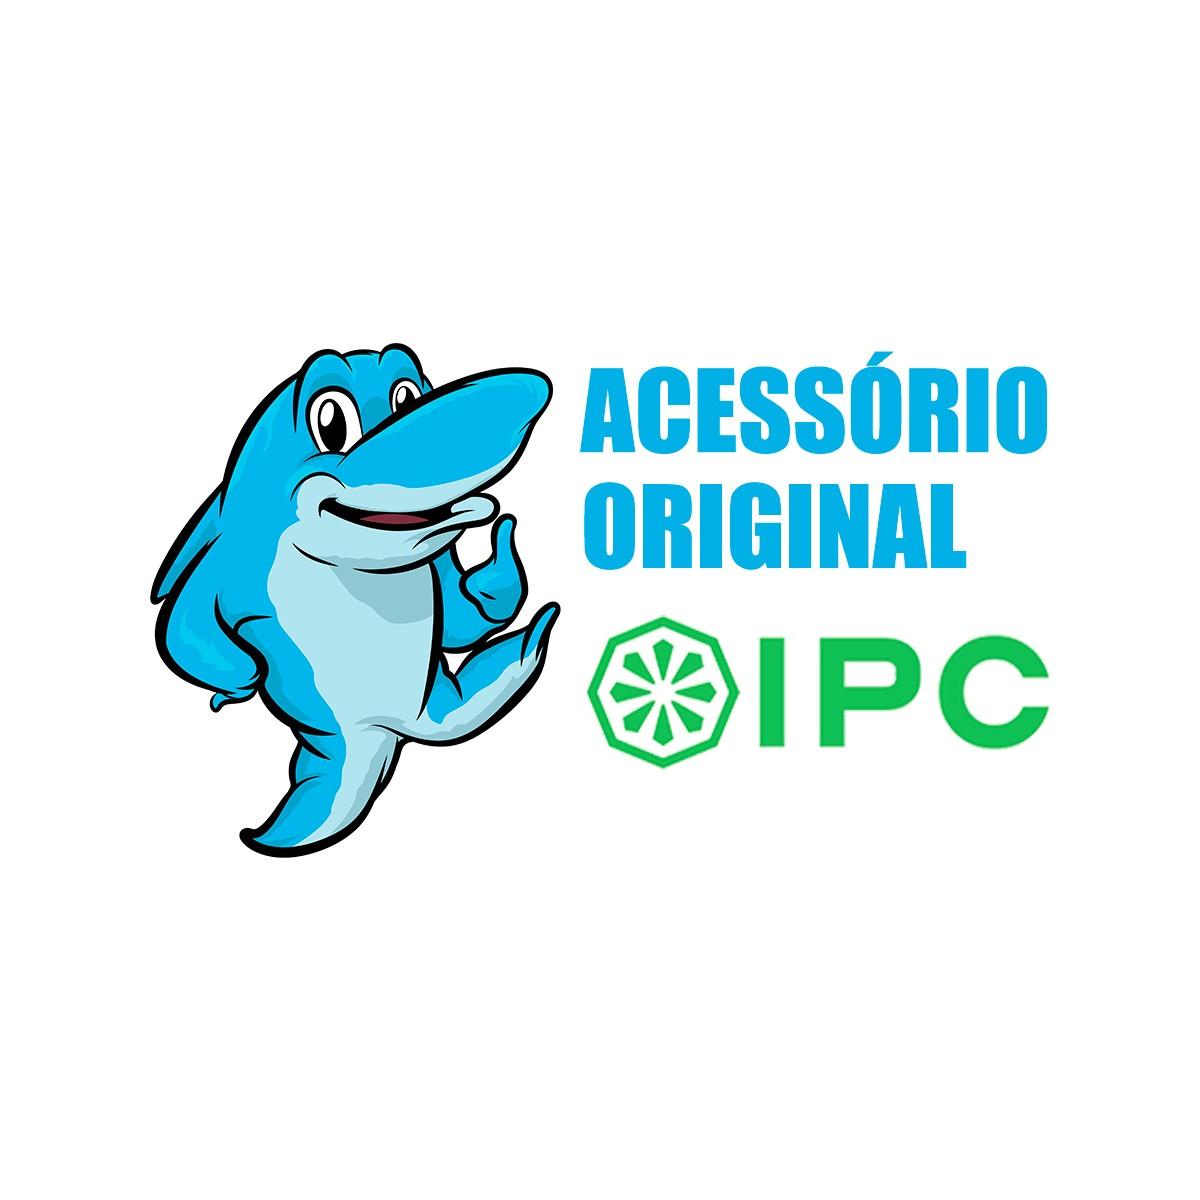 Filtro Original IPC para Aspirador de pó ECOCLEAN